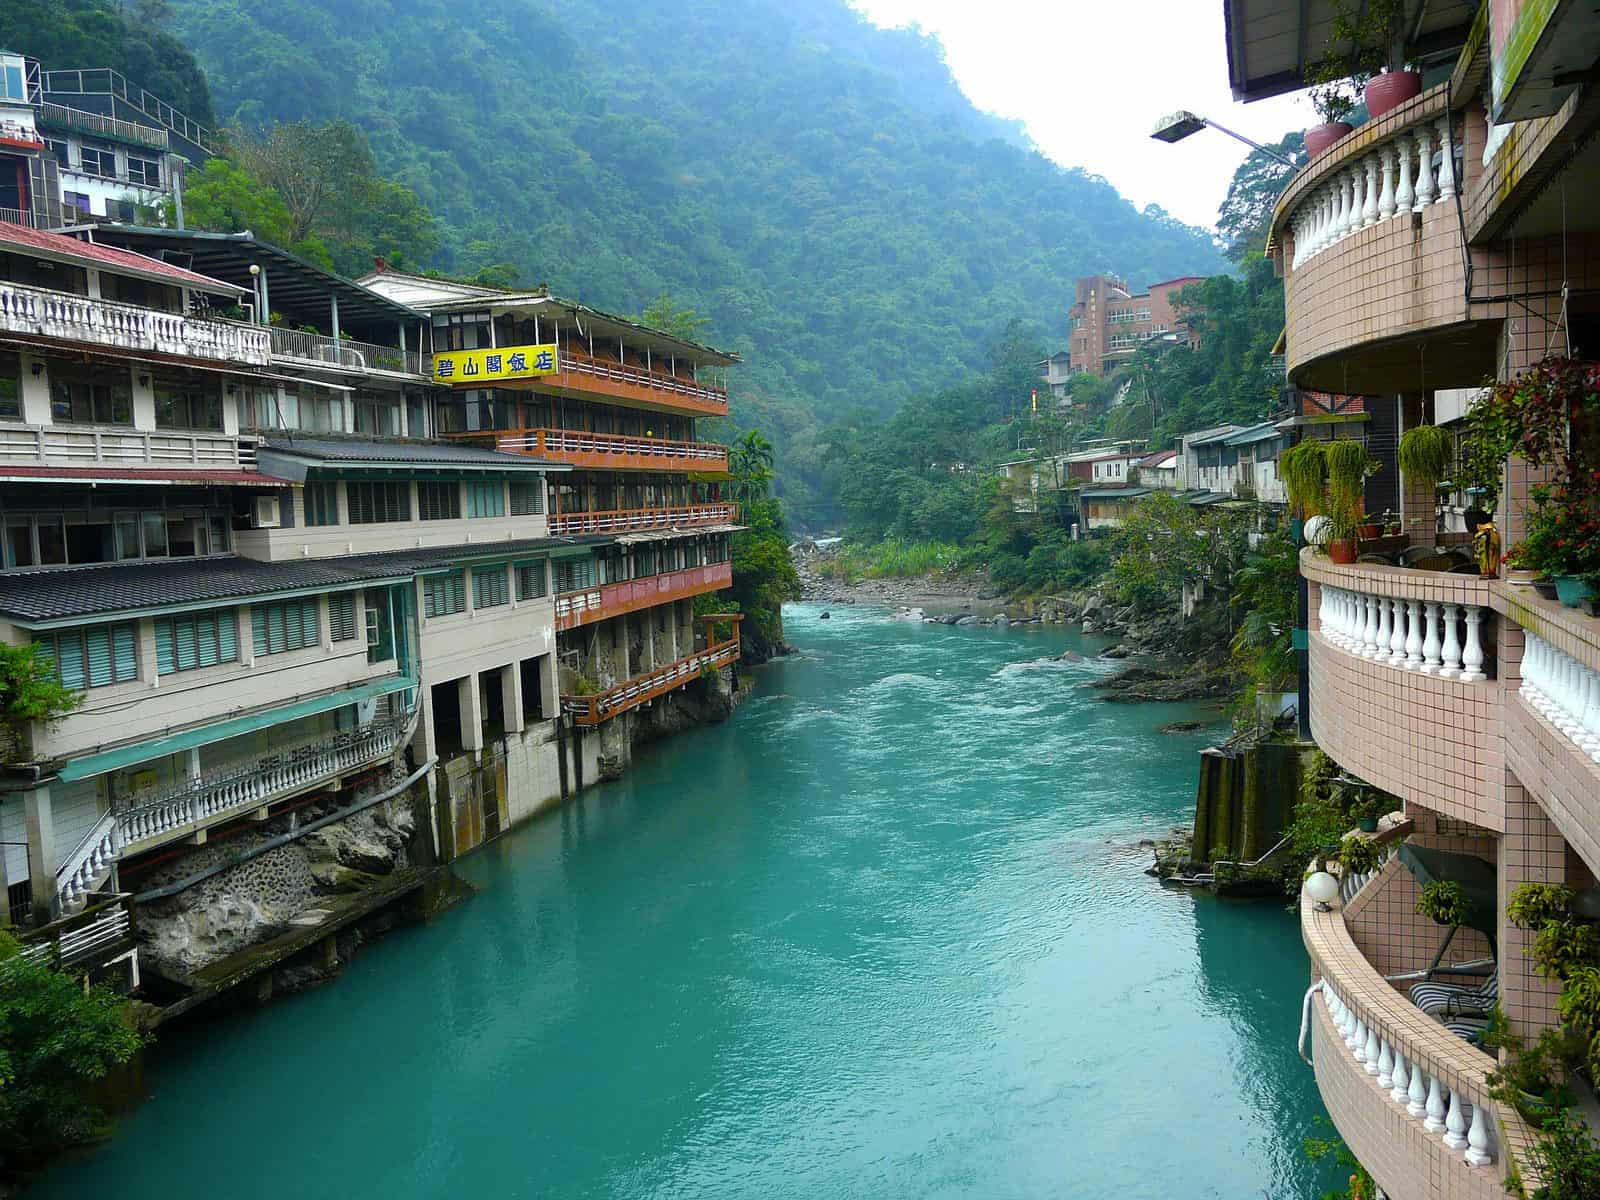 River through Wulai, Taiwan